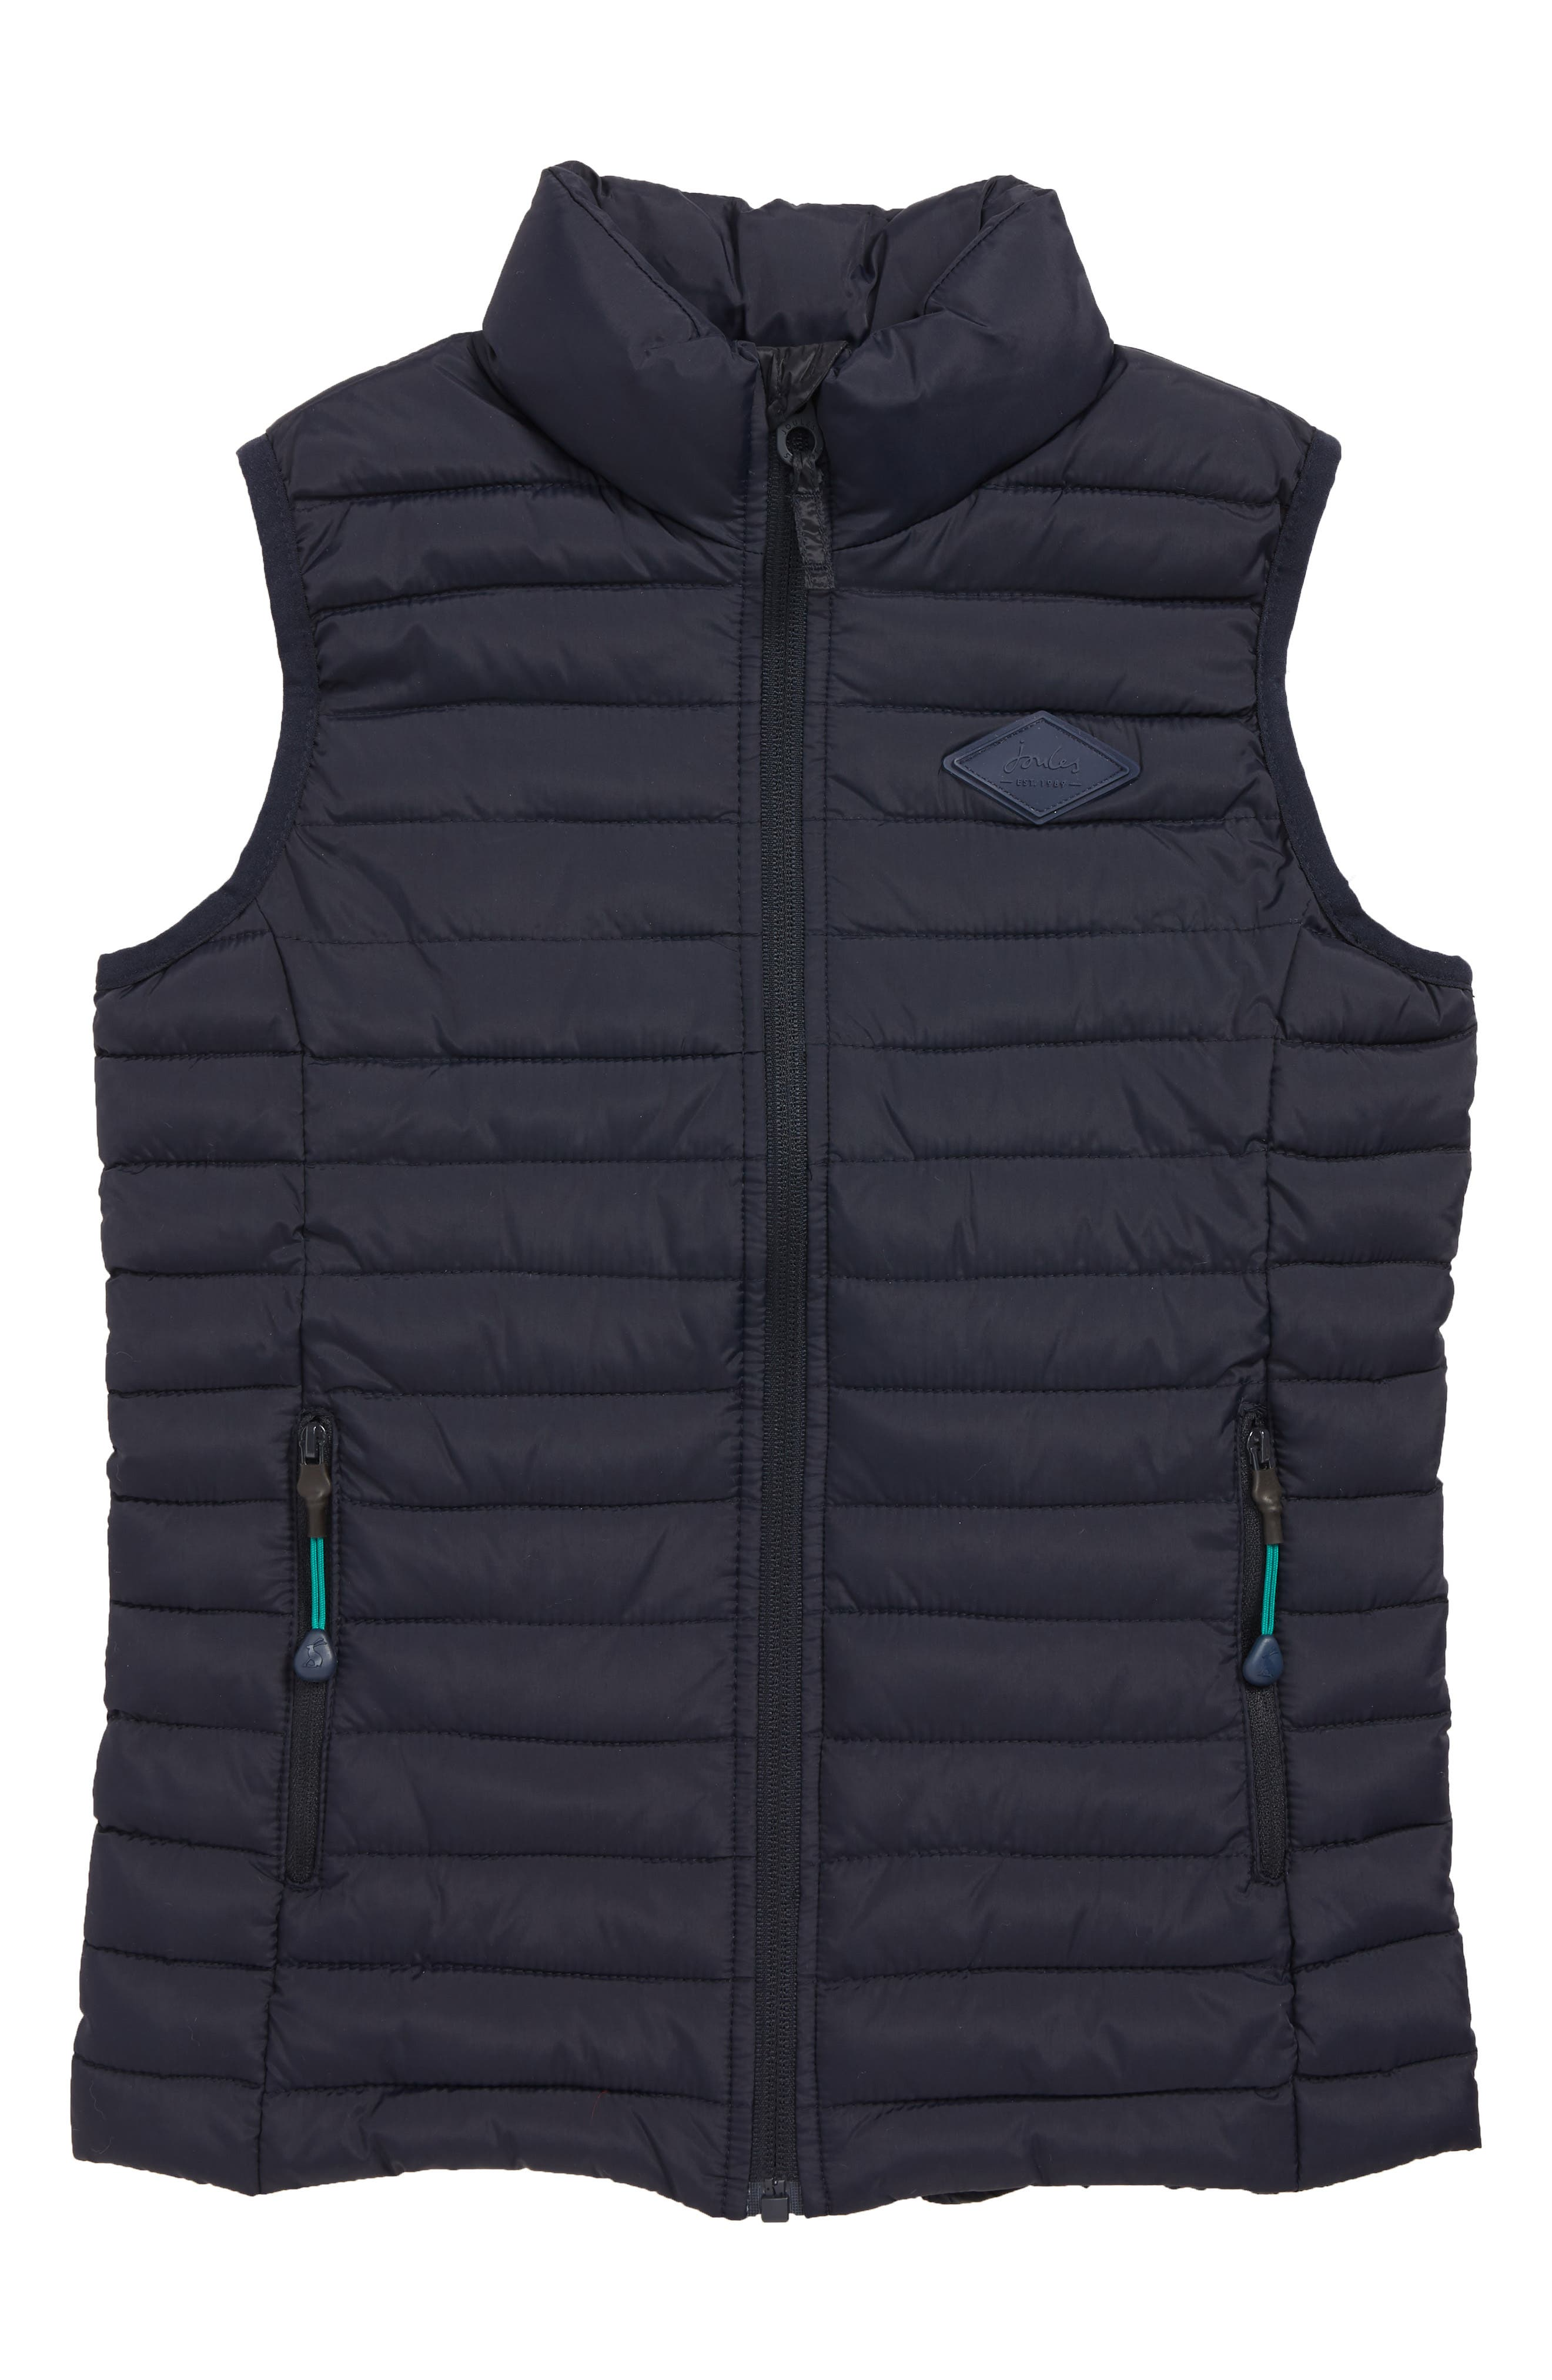 Boys Joules Crofton Packable Vest Size 6Y  Green